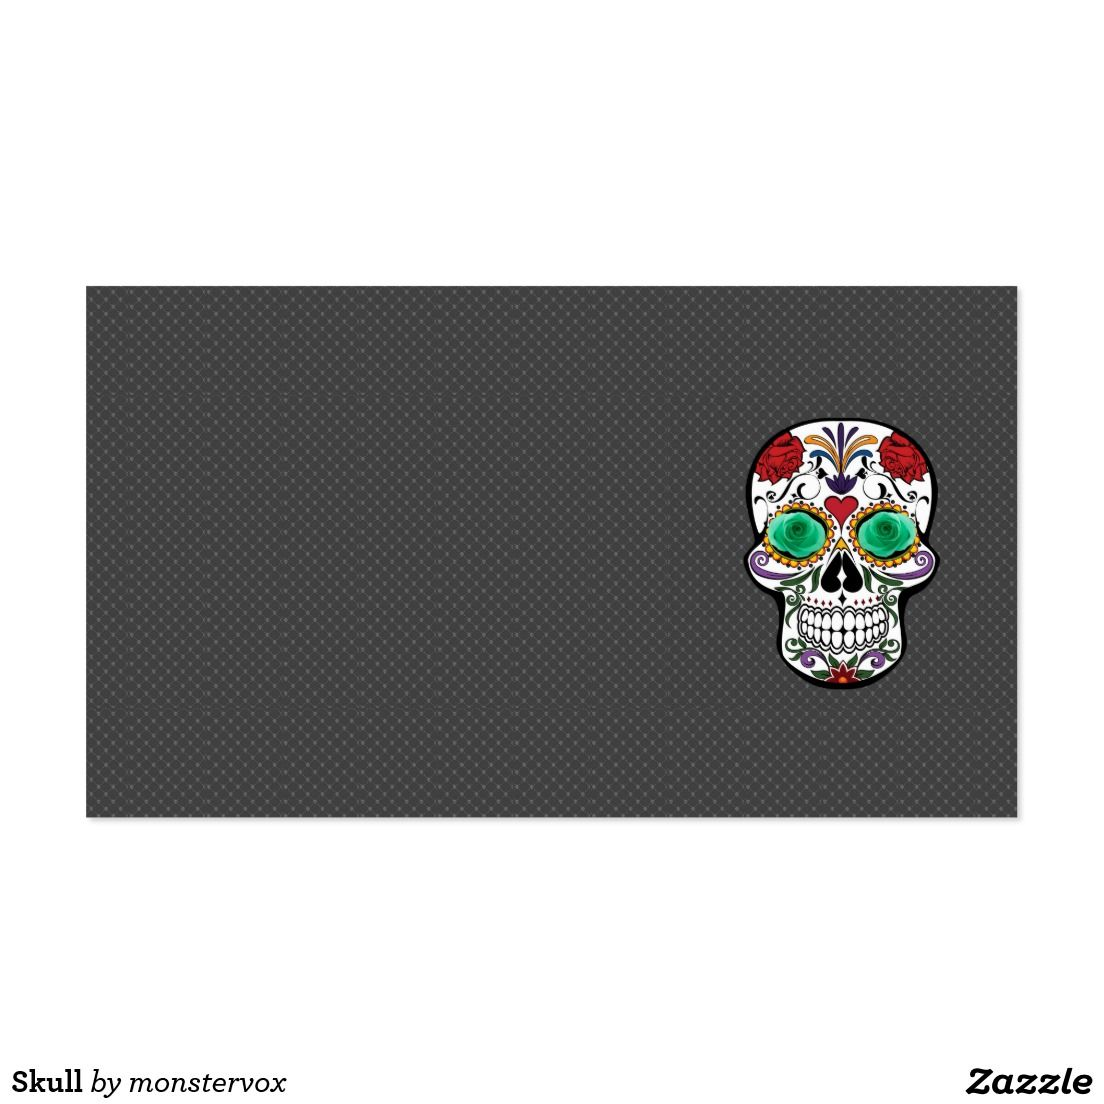 Skull business card skull holiday halloween flower rose skull business card skull holiday halloween flower rose fashion magicingreecefo Choice Image